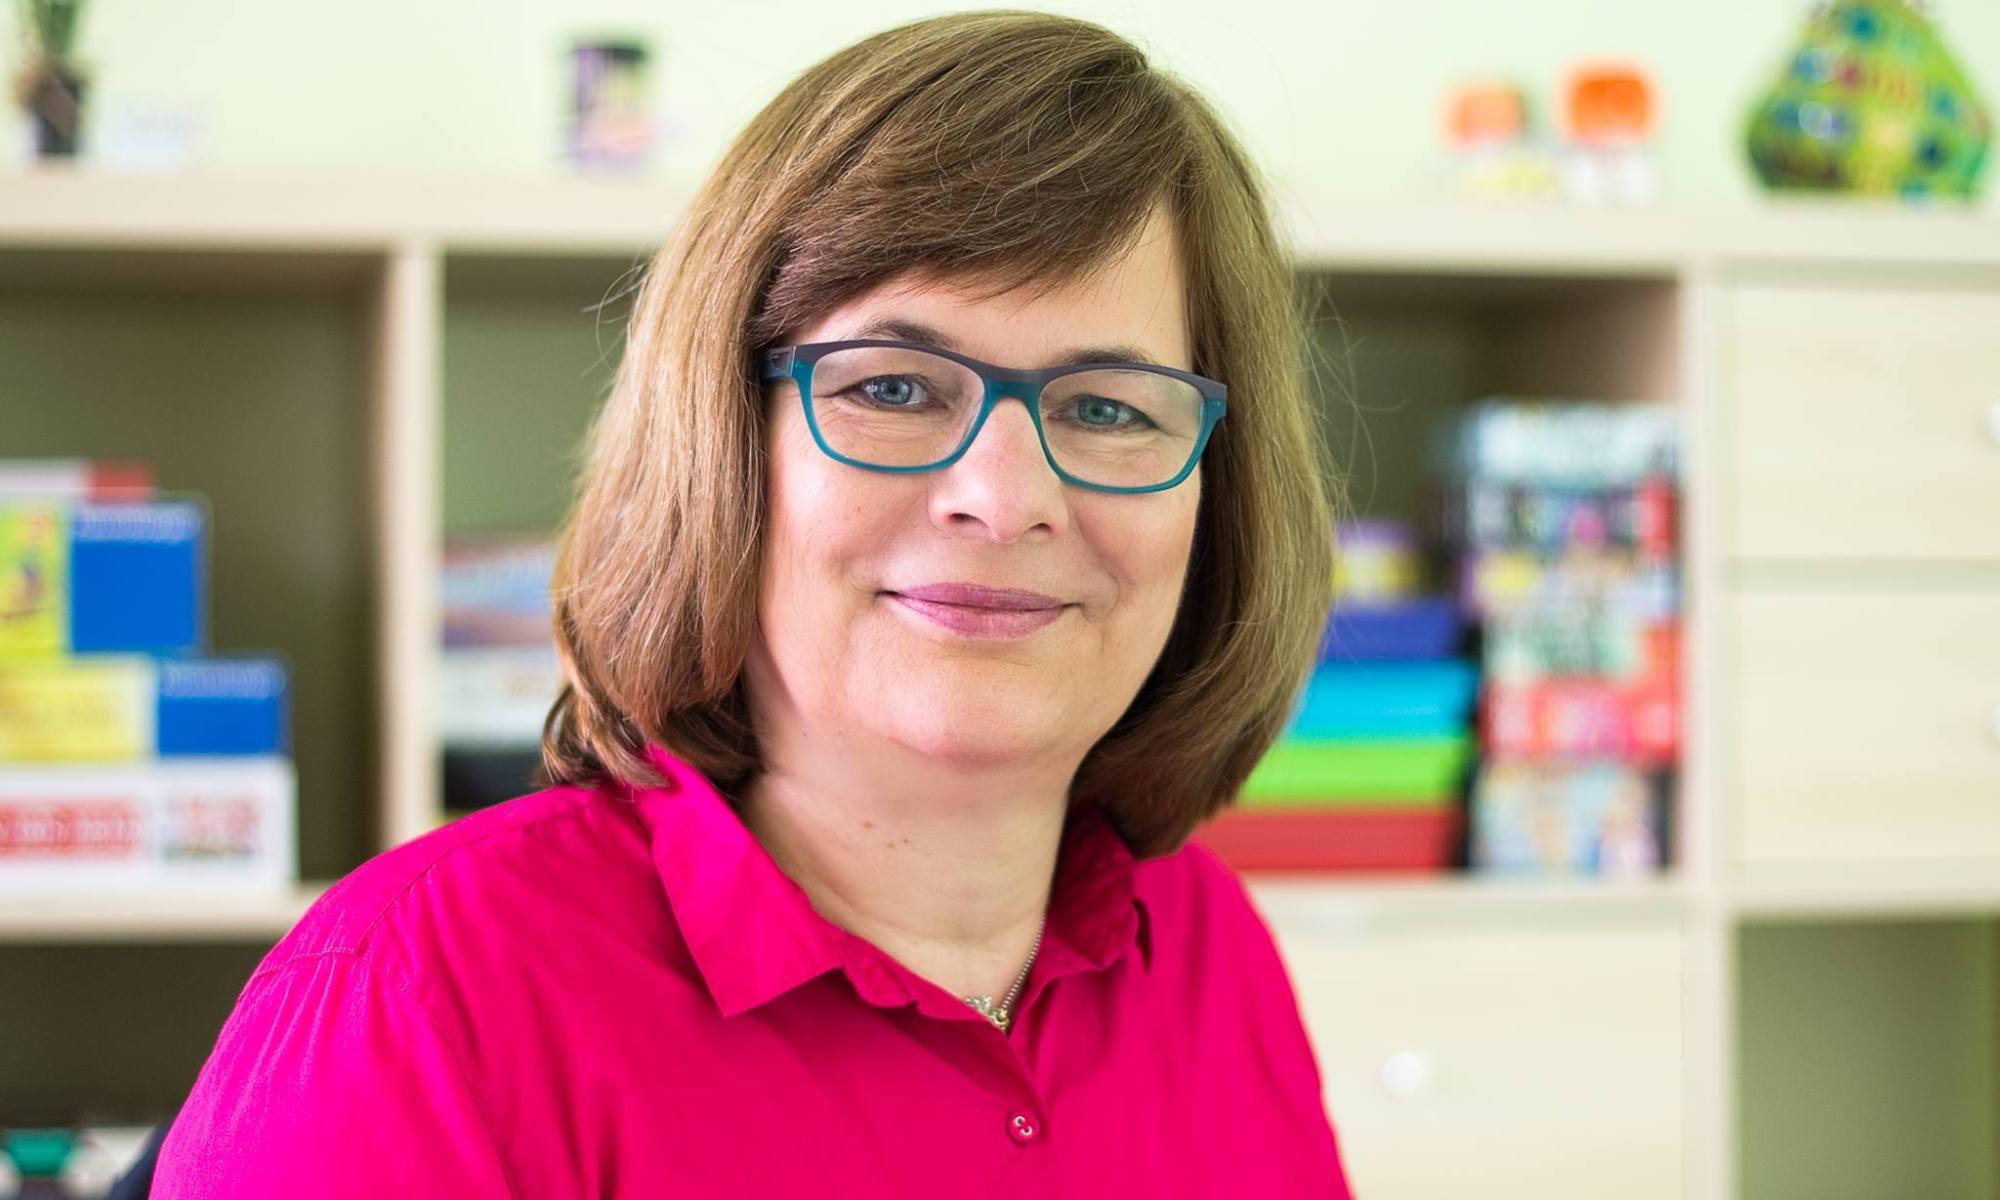 Sabine Omarow